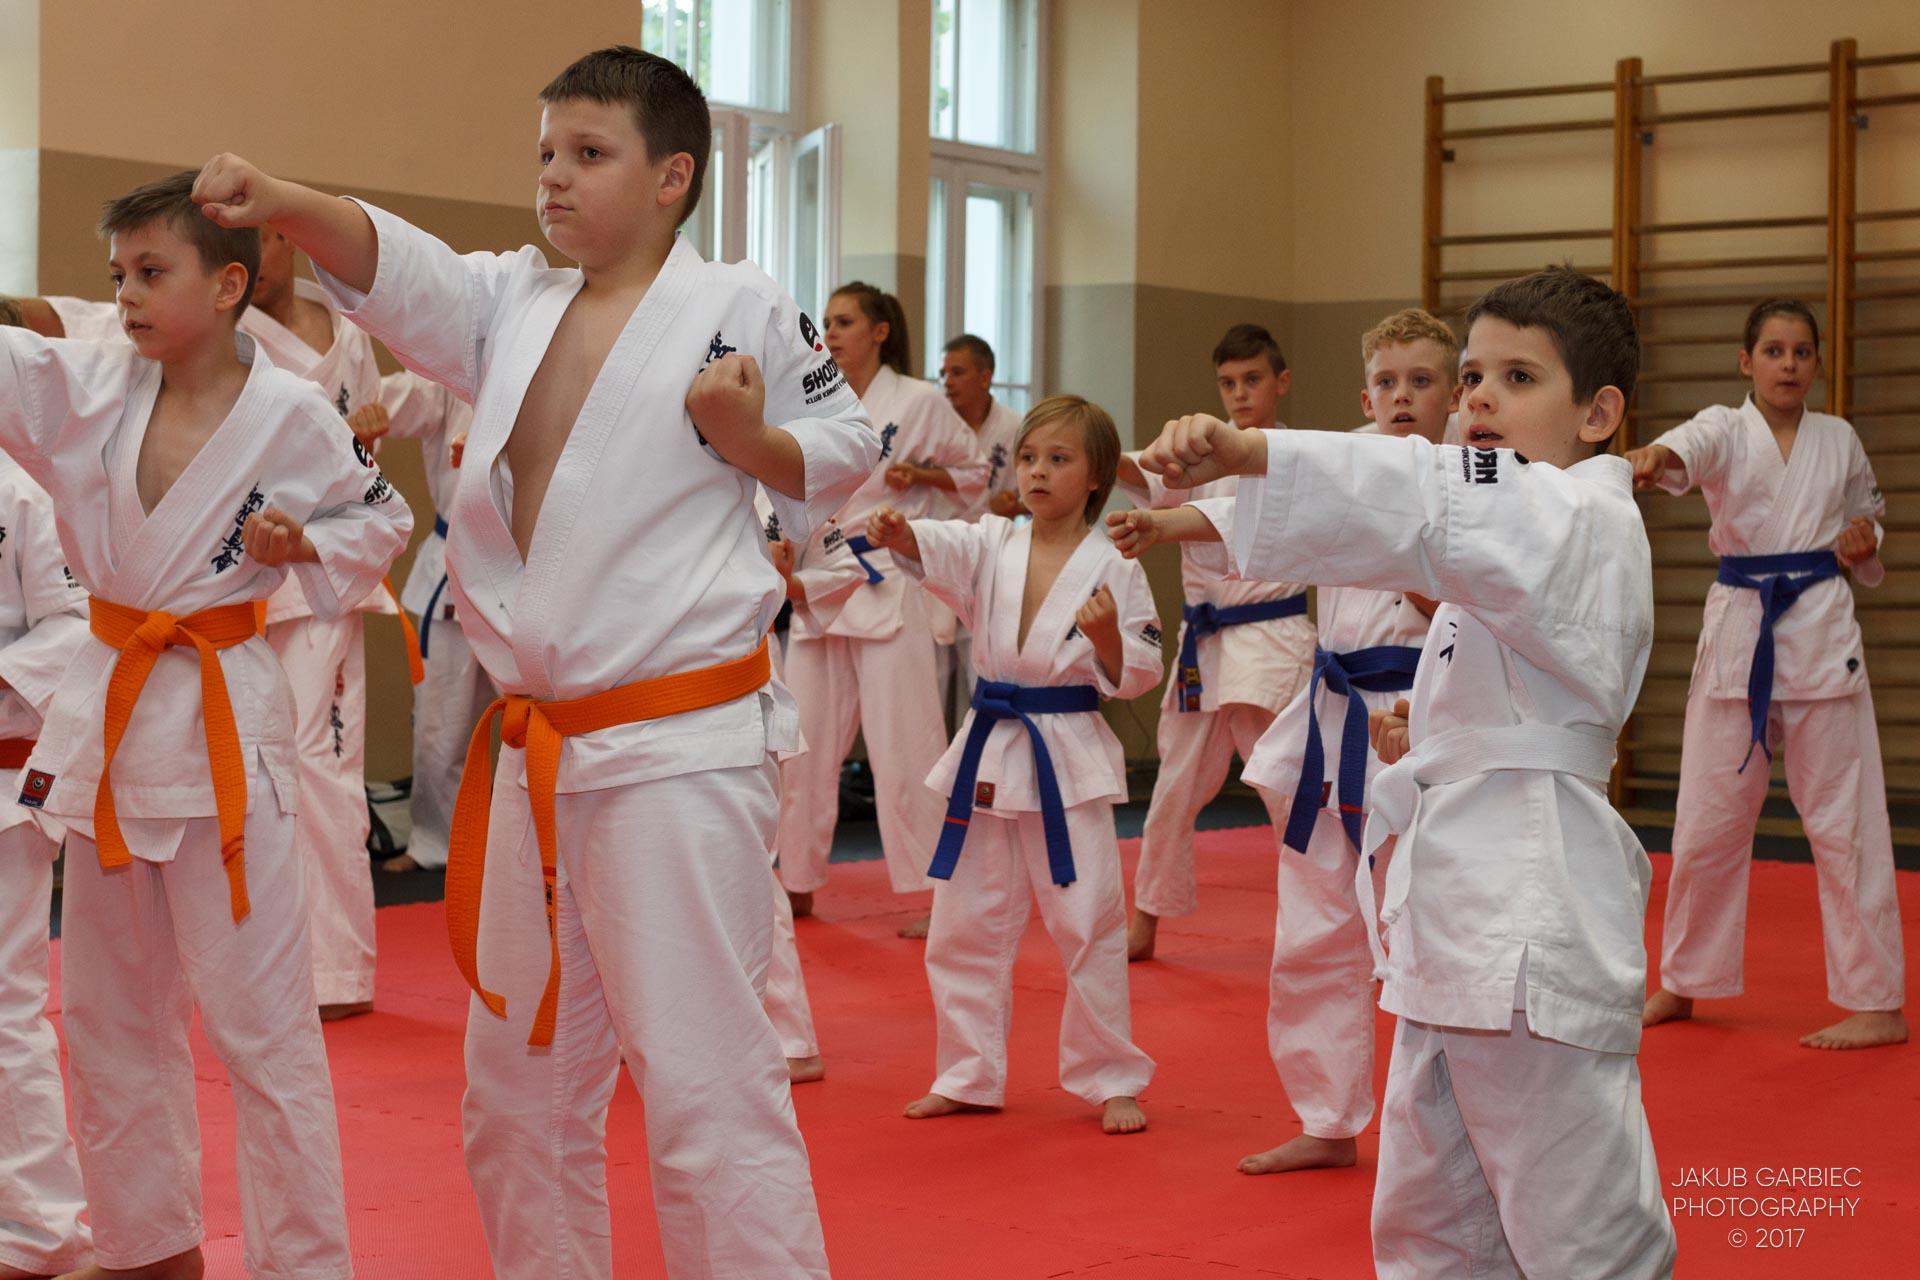 egzamin-karate-mistrz-mariusz-mazur-klub-karate-shodan-2017-06-02-12